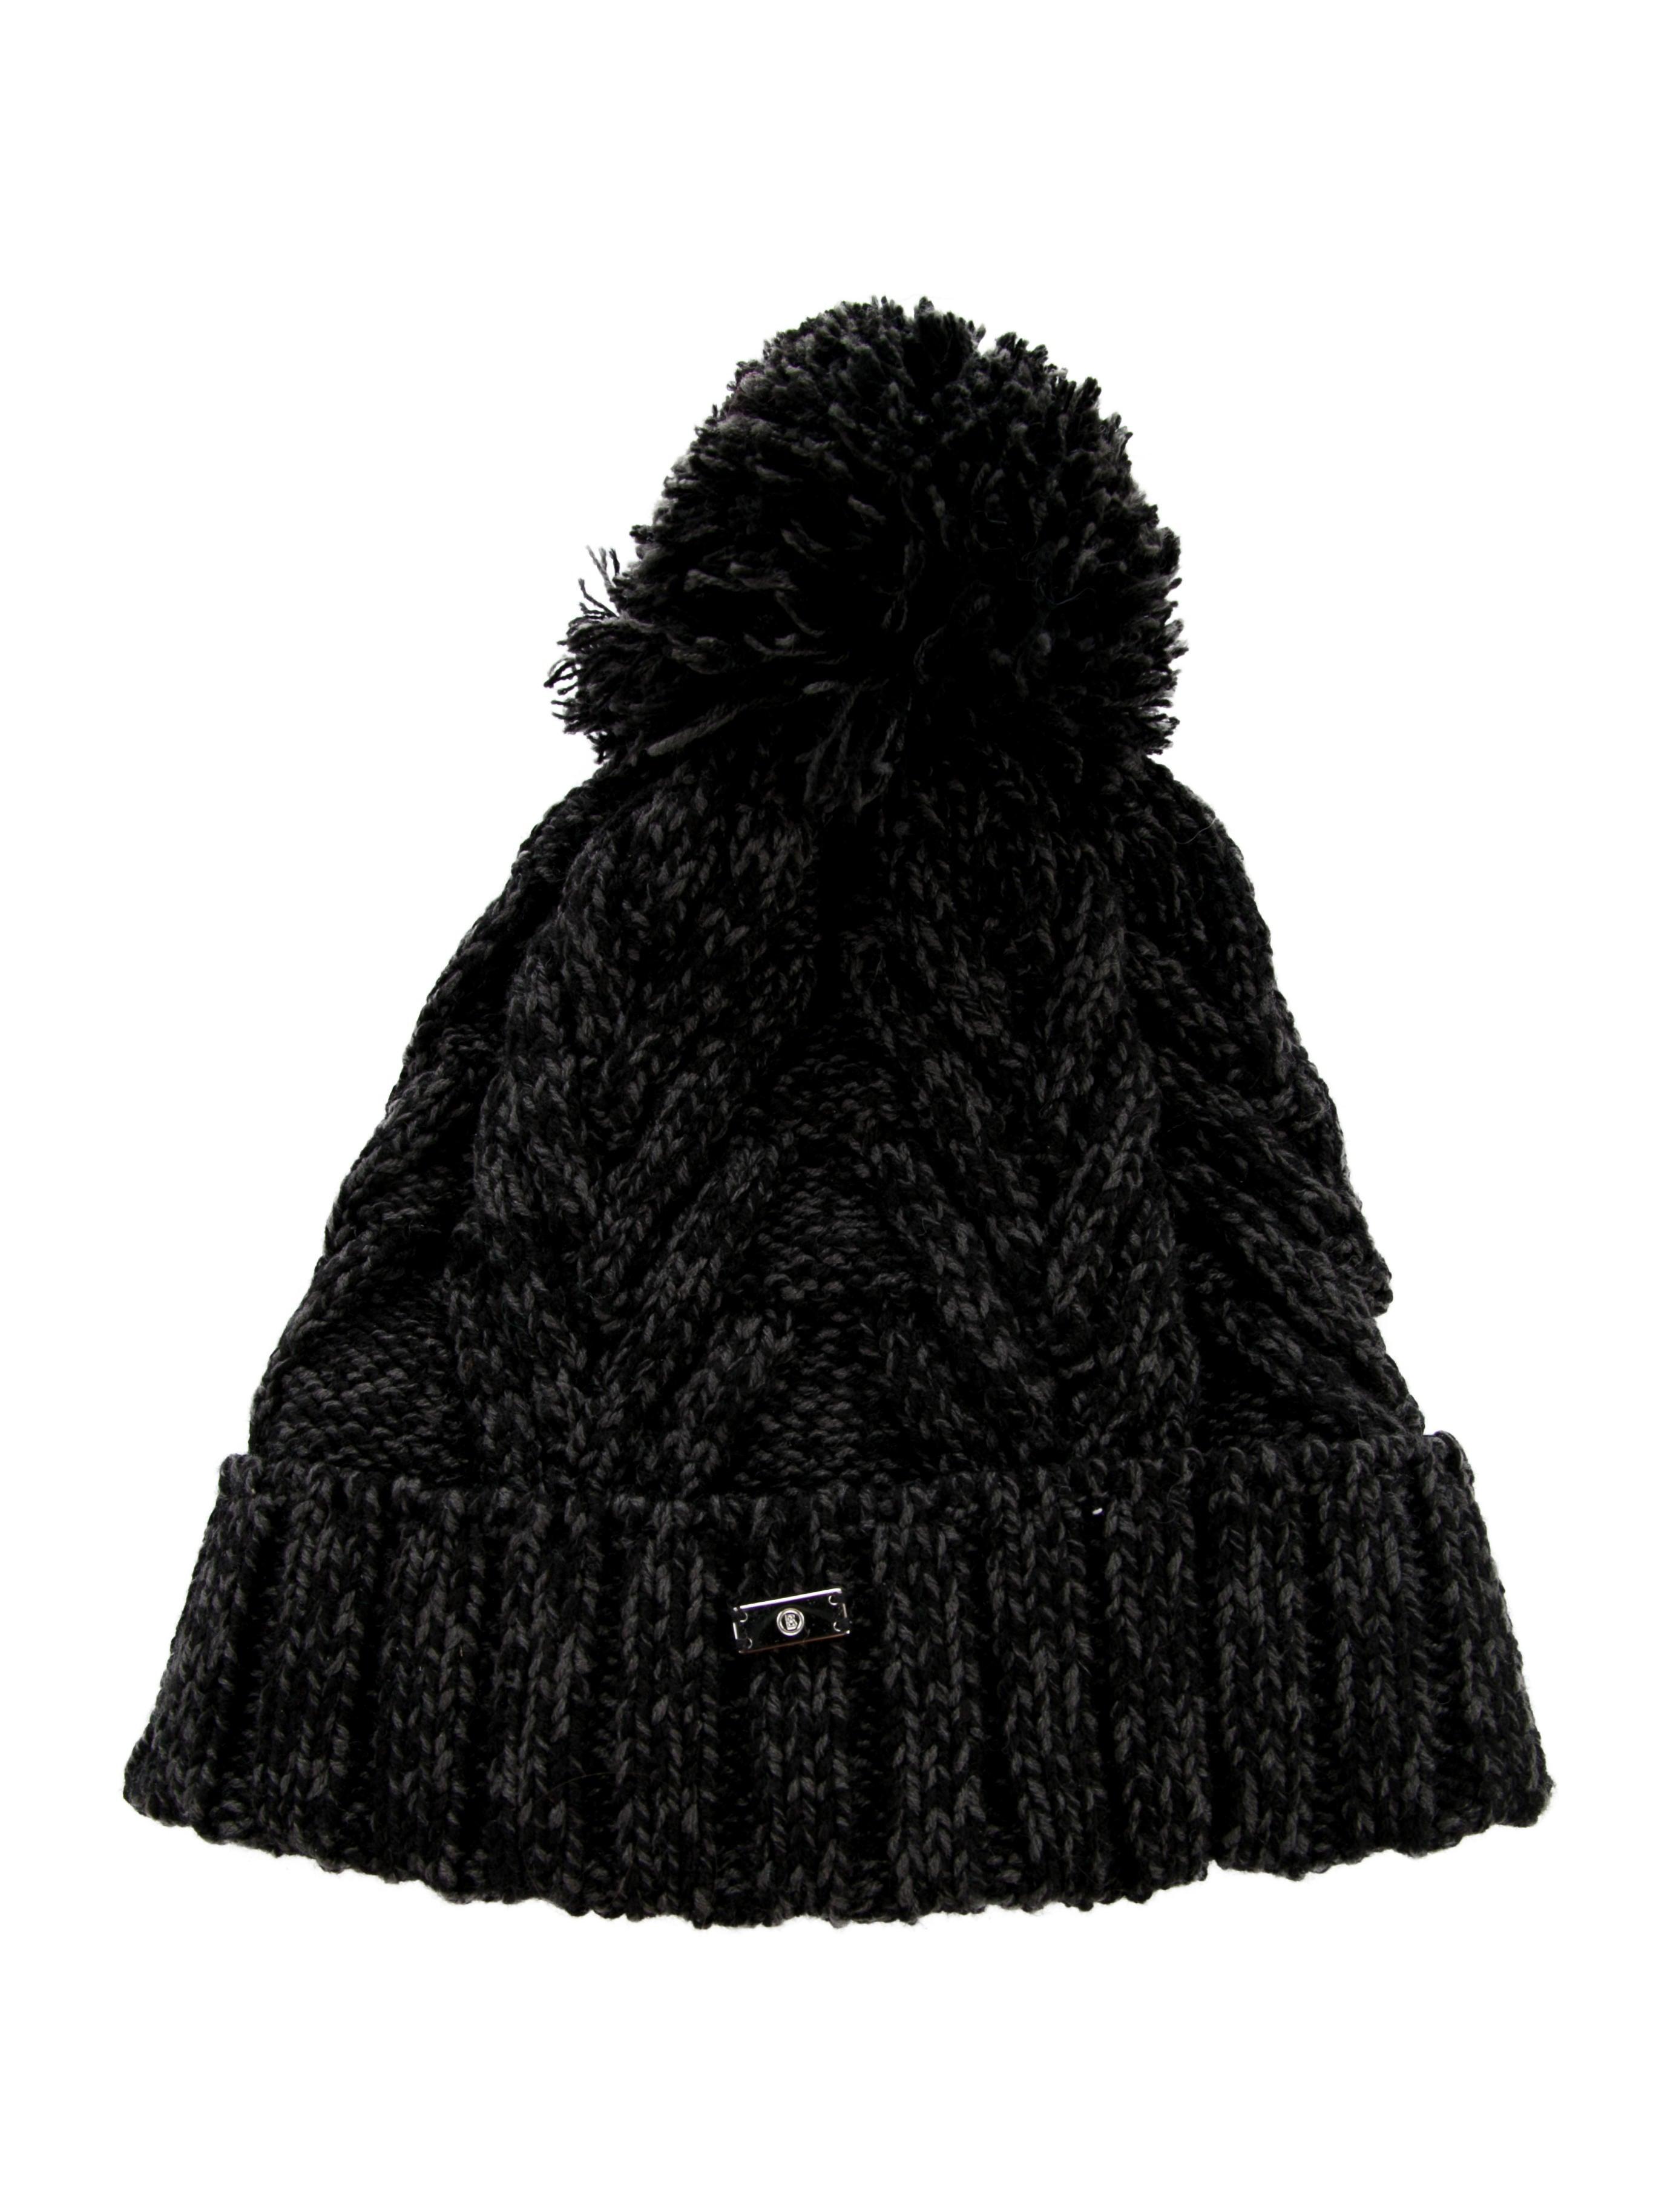 250af6753e3 Bogner Knit Pom-Pom Beanie w  Tags - Accessories - WB121840